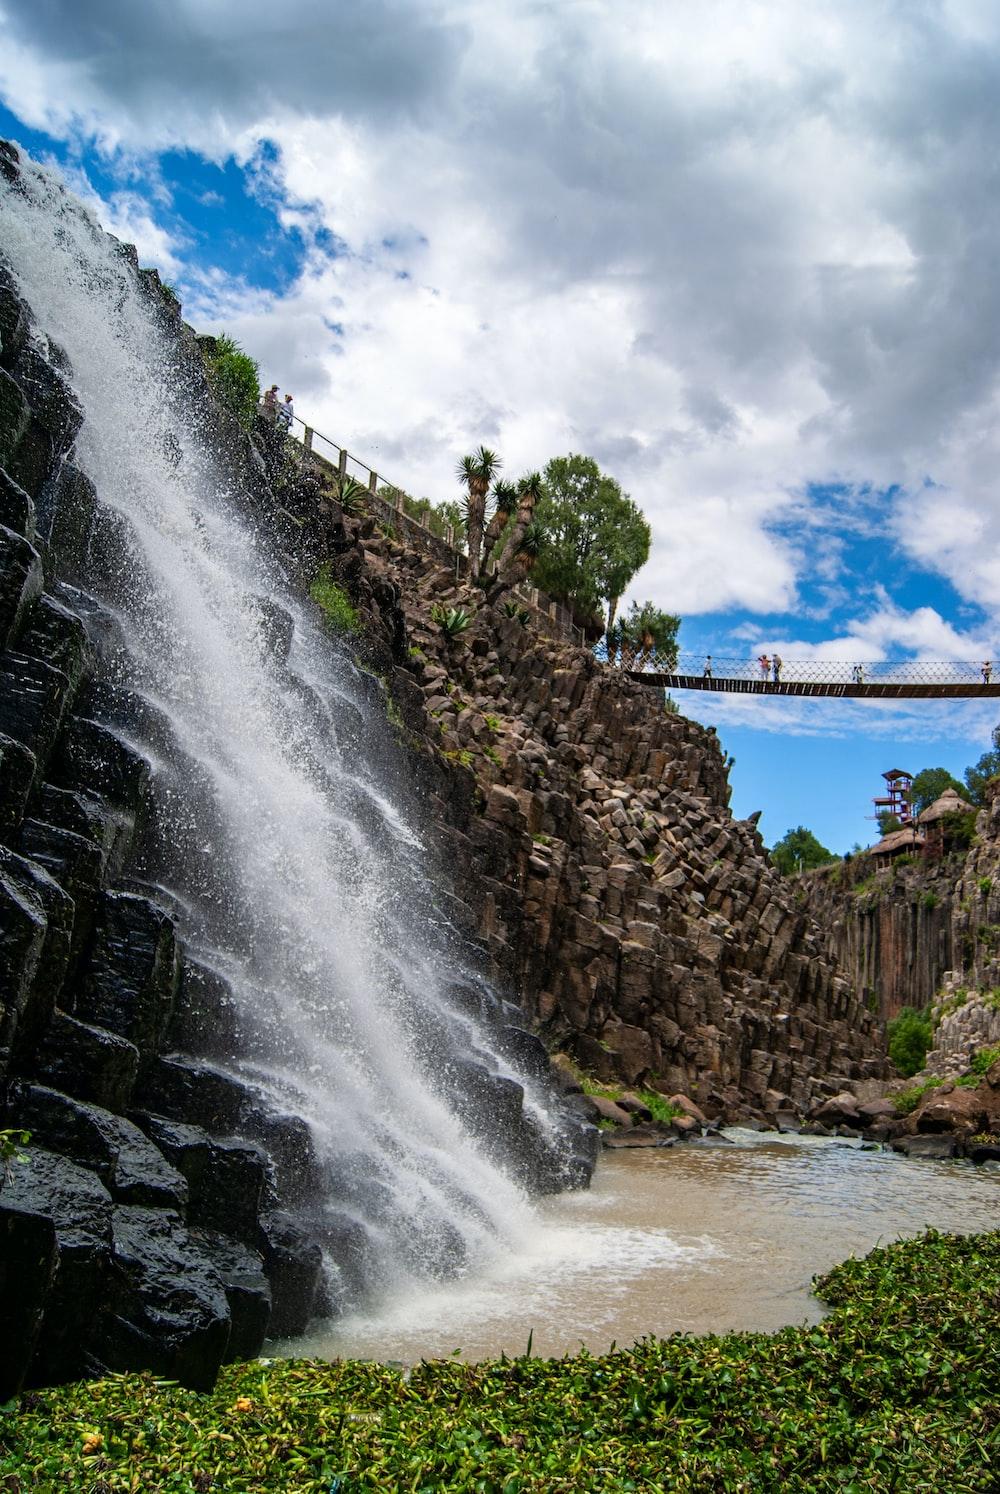 waterfalls near bridge